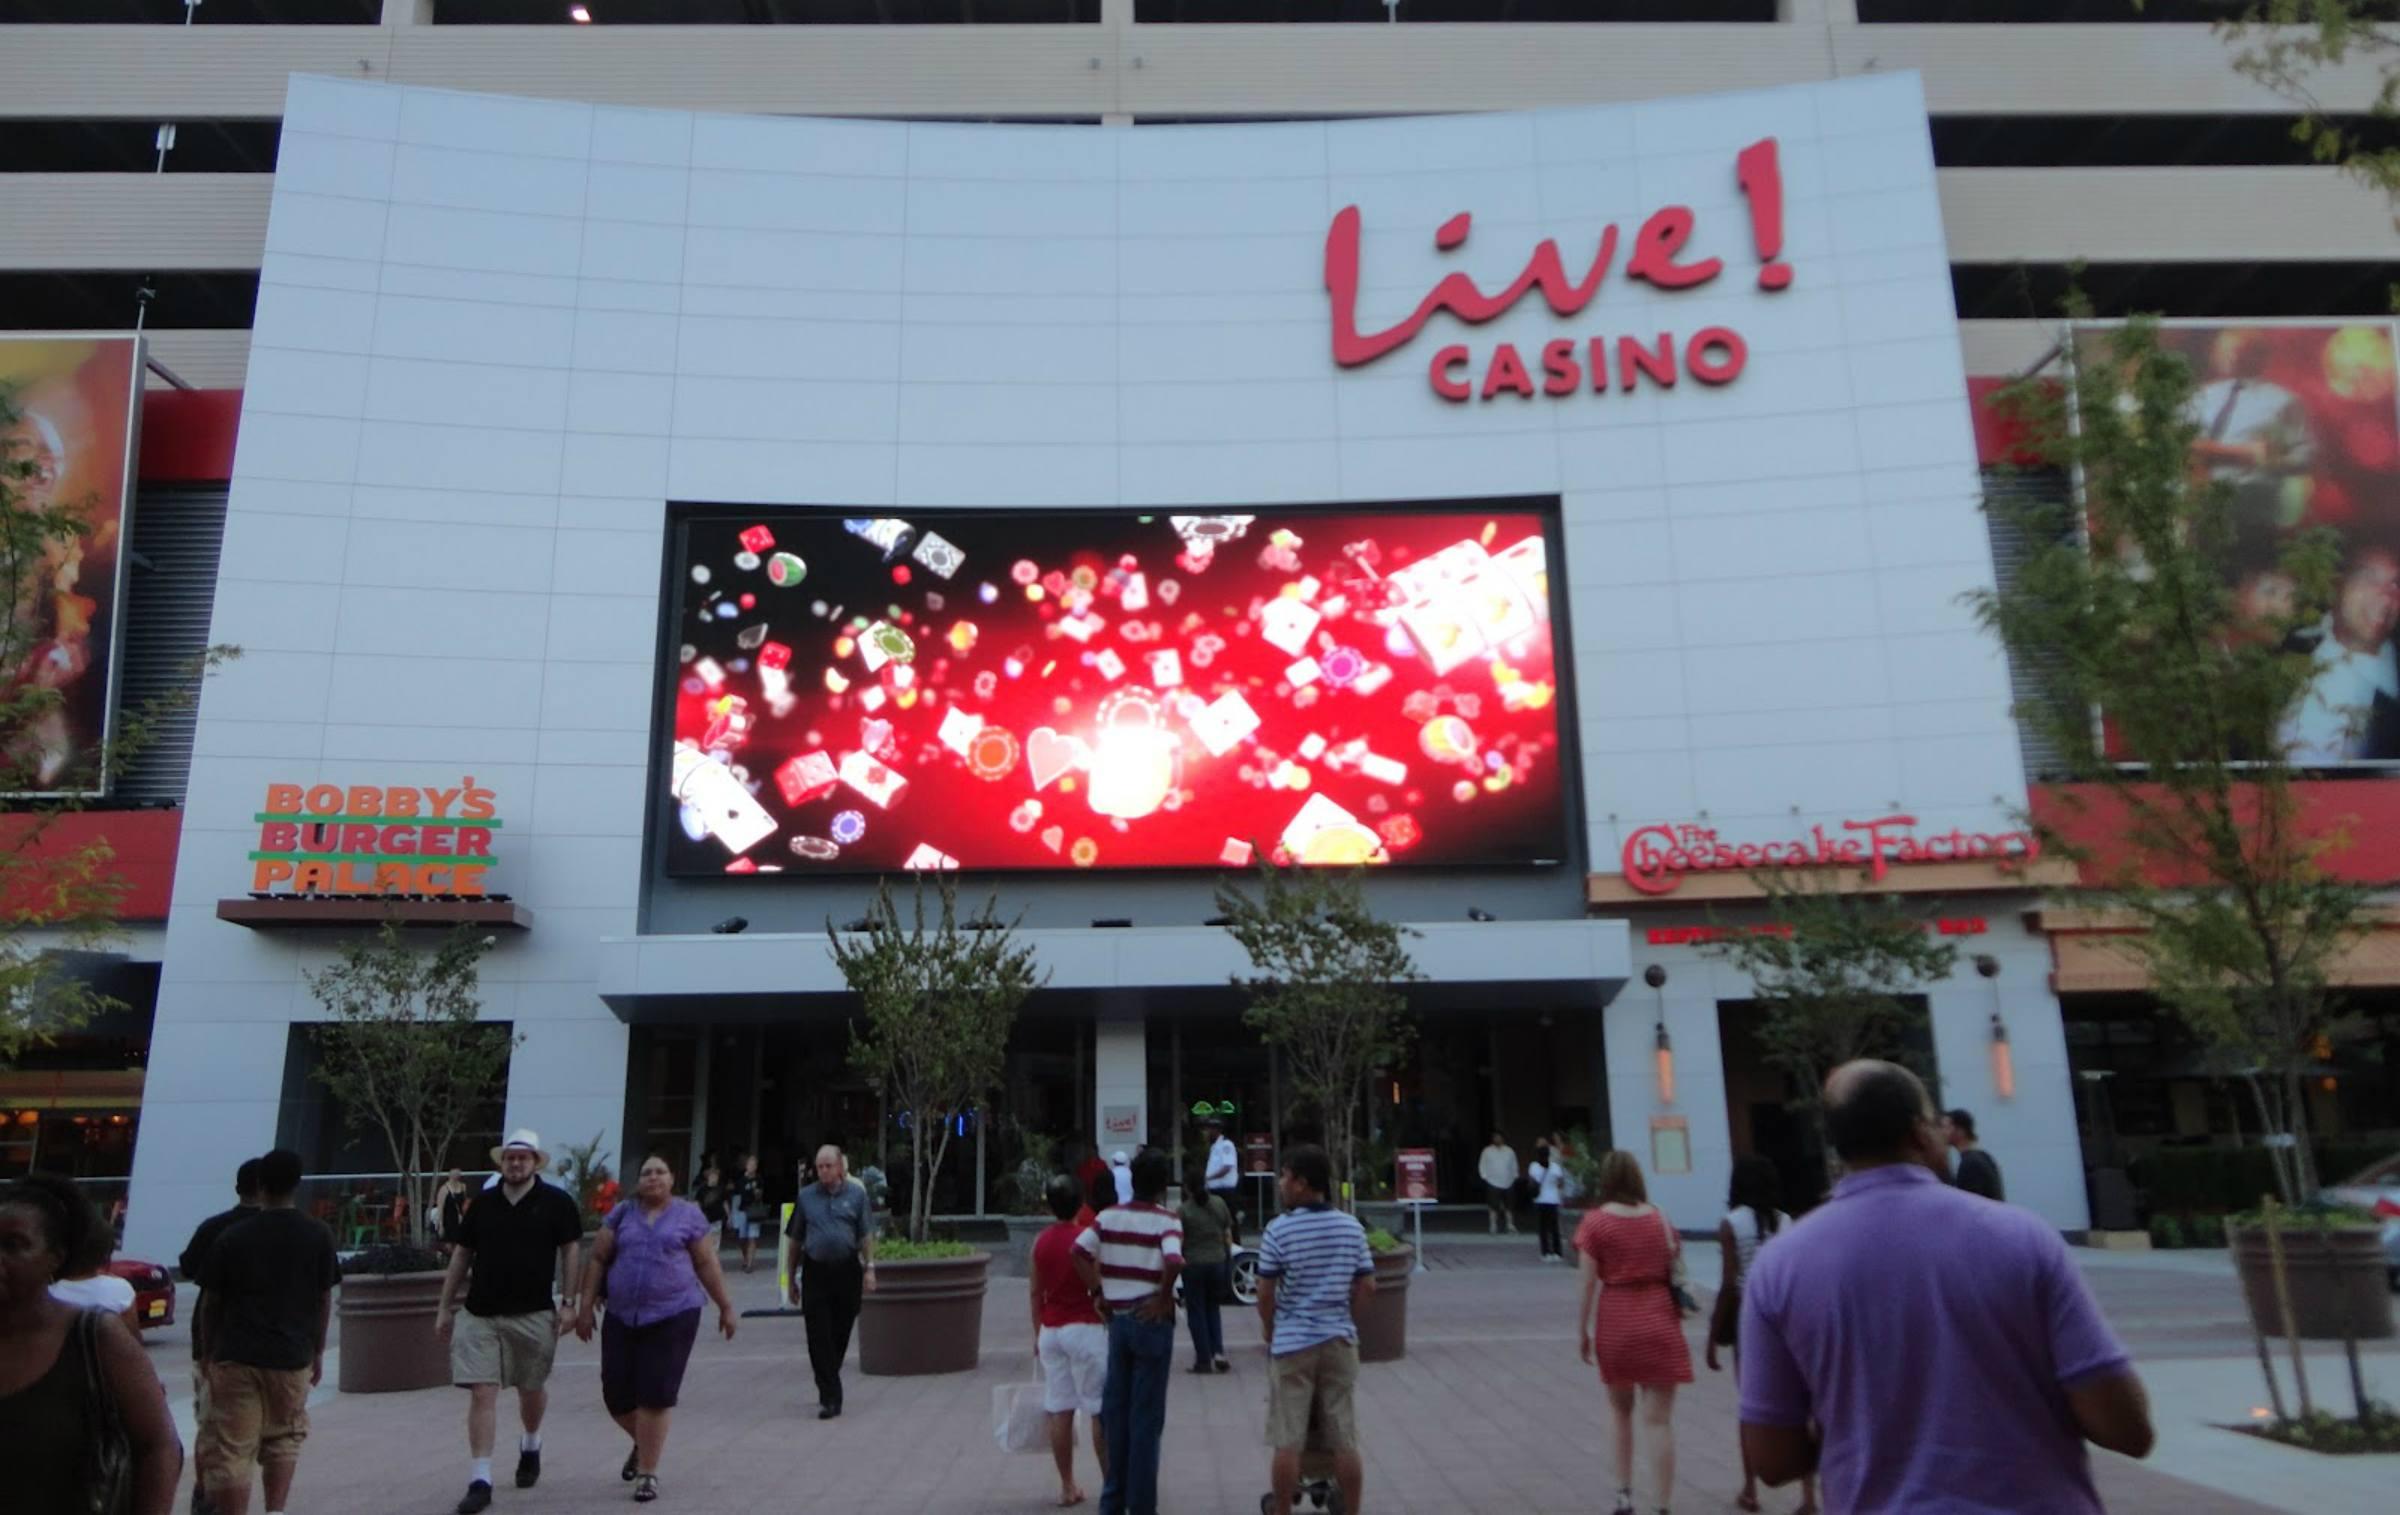 Maryland Live casino smoking gaming area